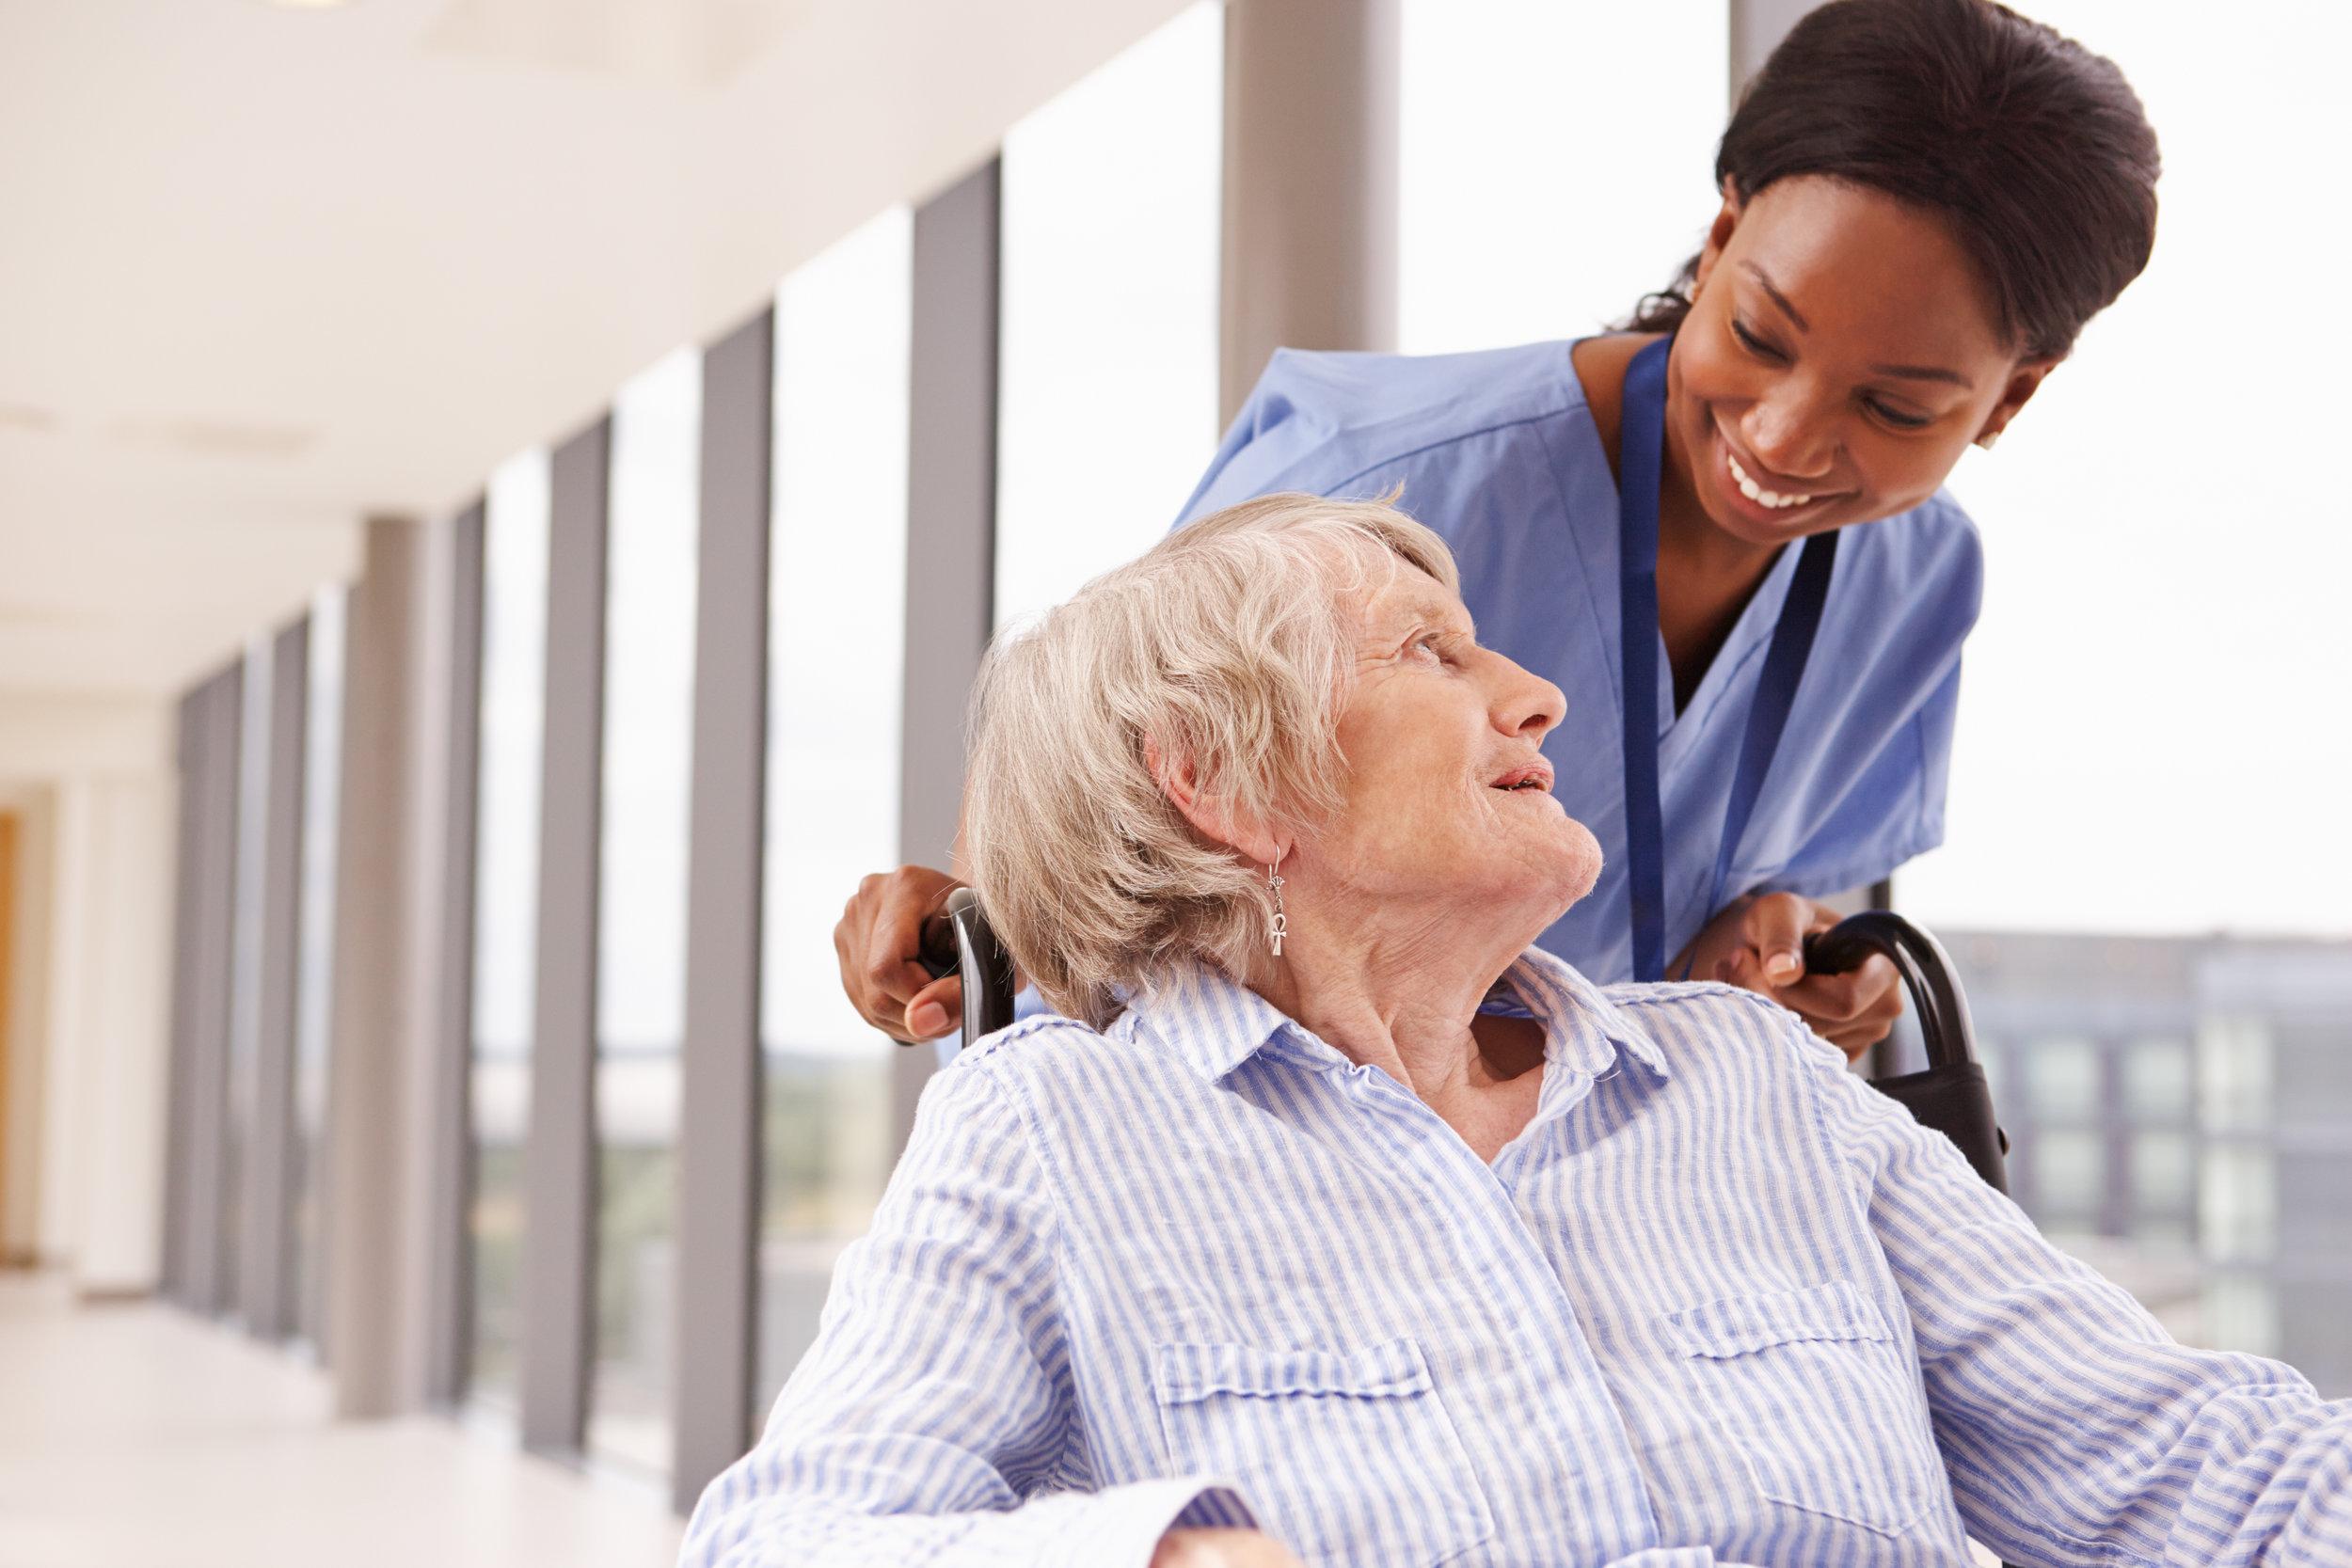 Nurse-Pushing-Senior-Patient-In-Wheelchair-Along-Corridor-488756218_4992x3328.jpeg